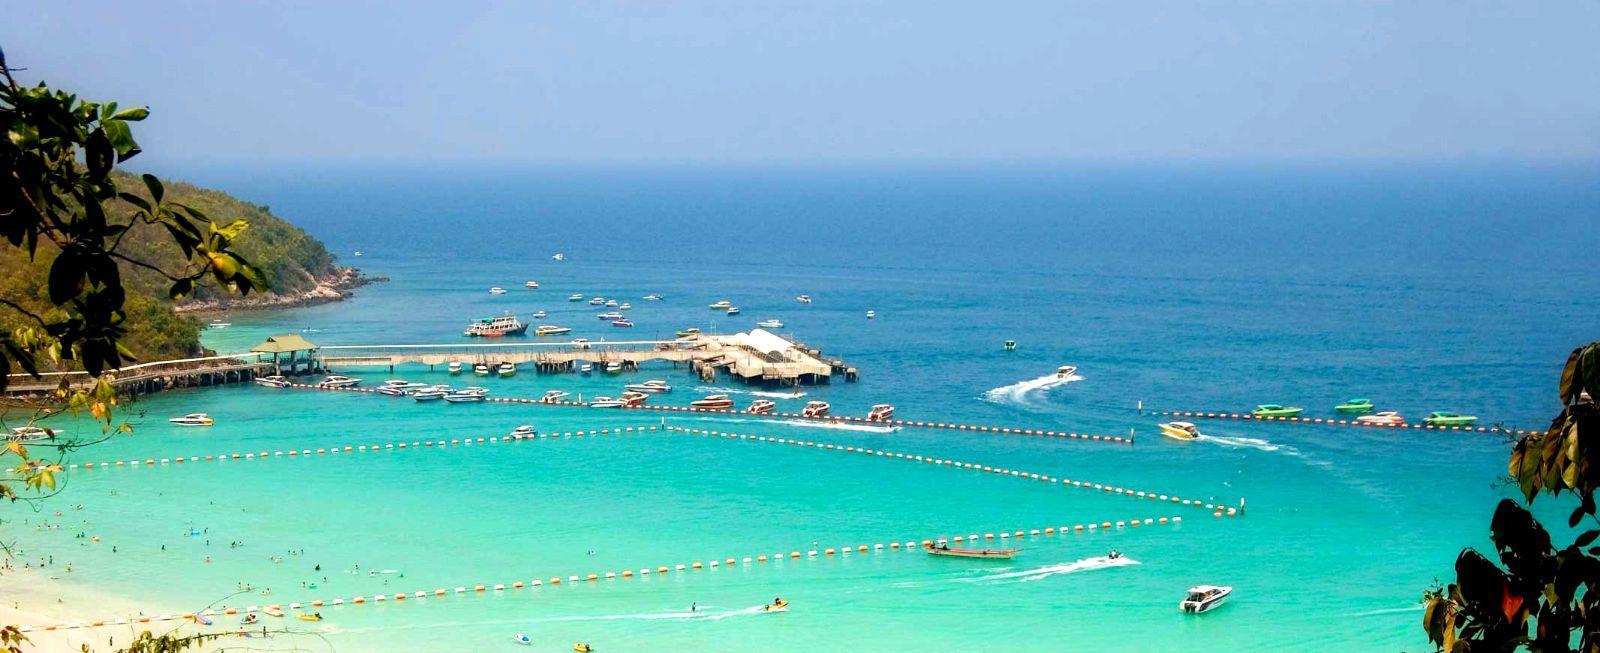 Таиланд перед сезоном